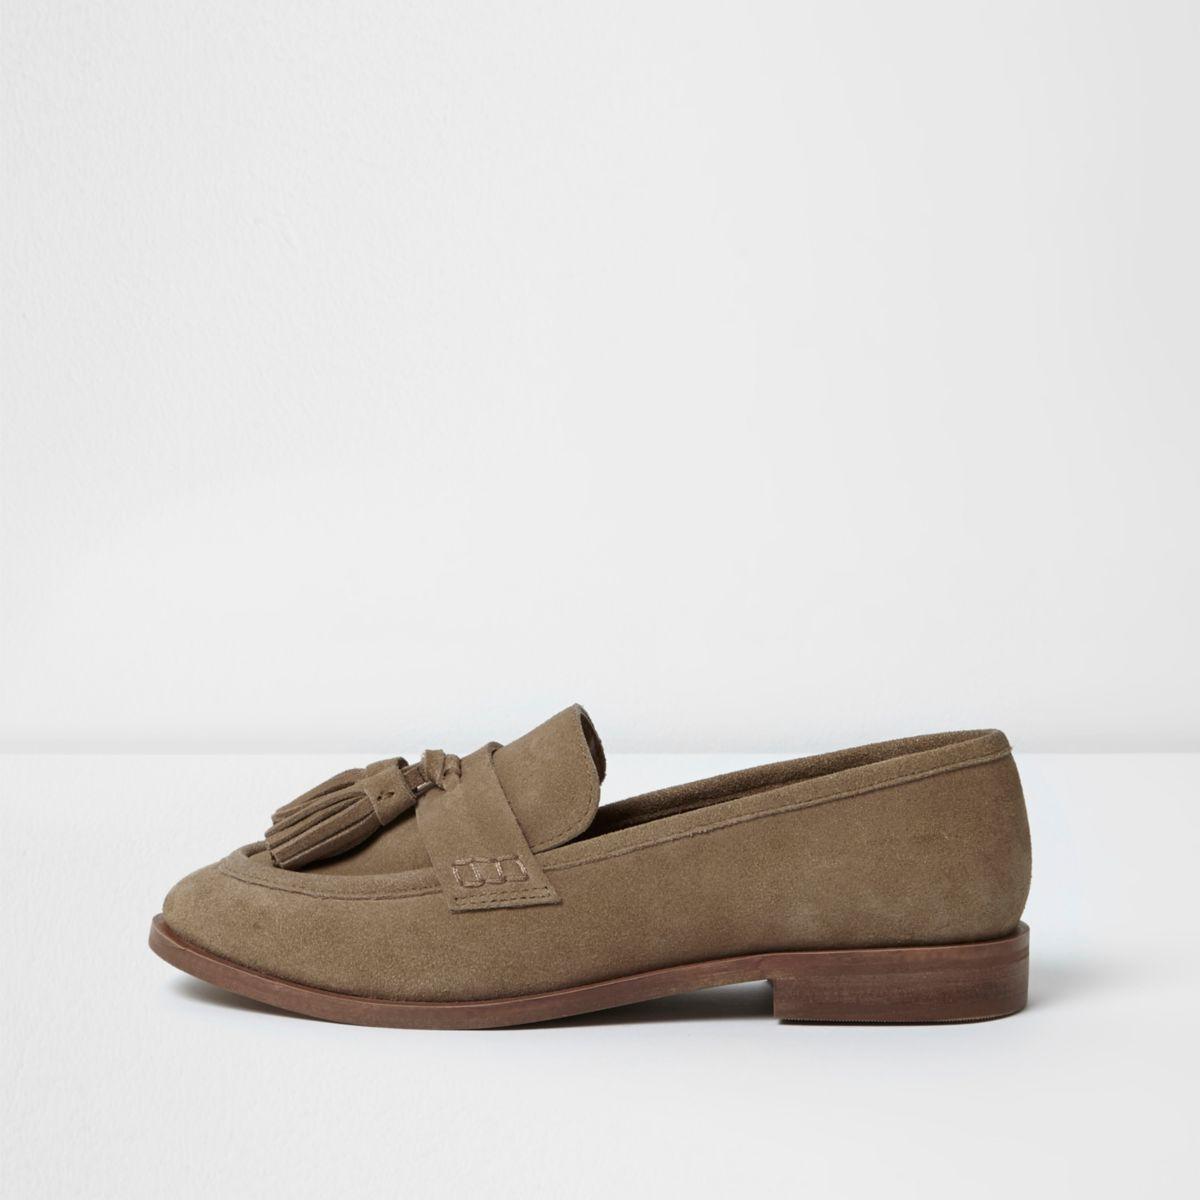 Light brown suede tassel loafers